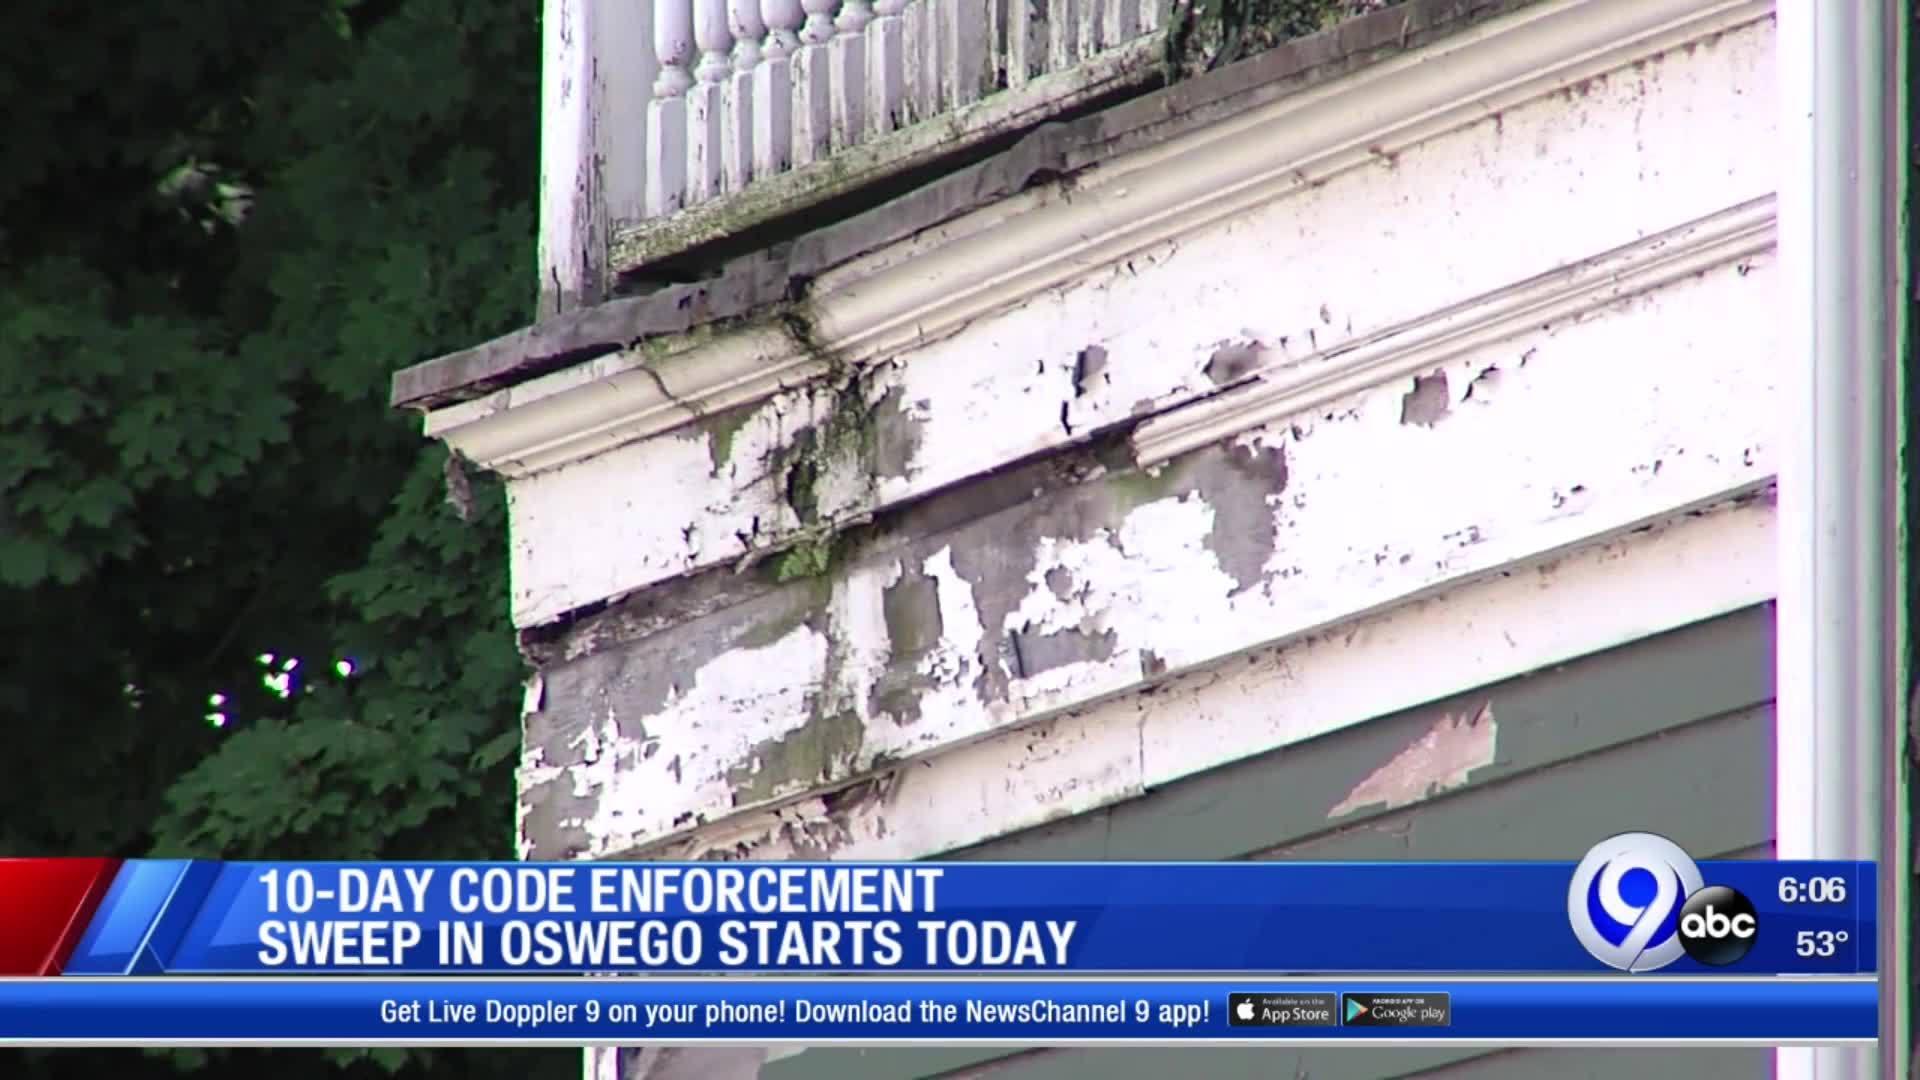 City_of_Oswego_begins_10_day_code_enforc_6_20190517131211